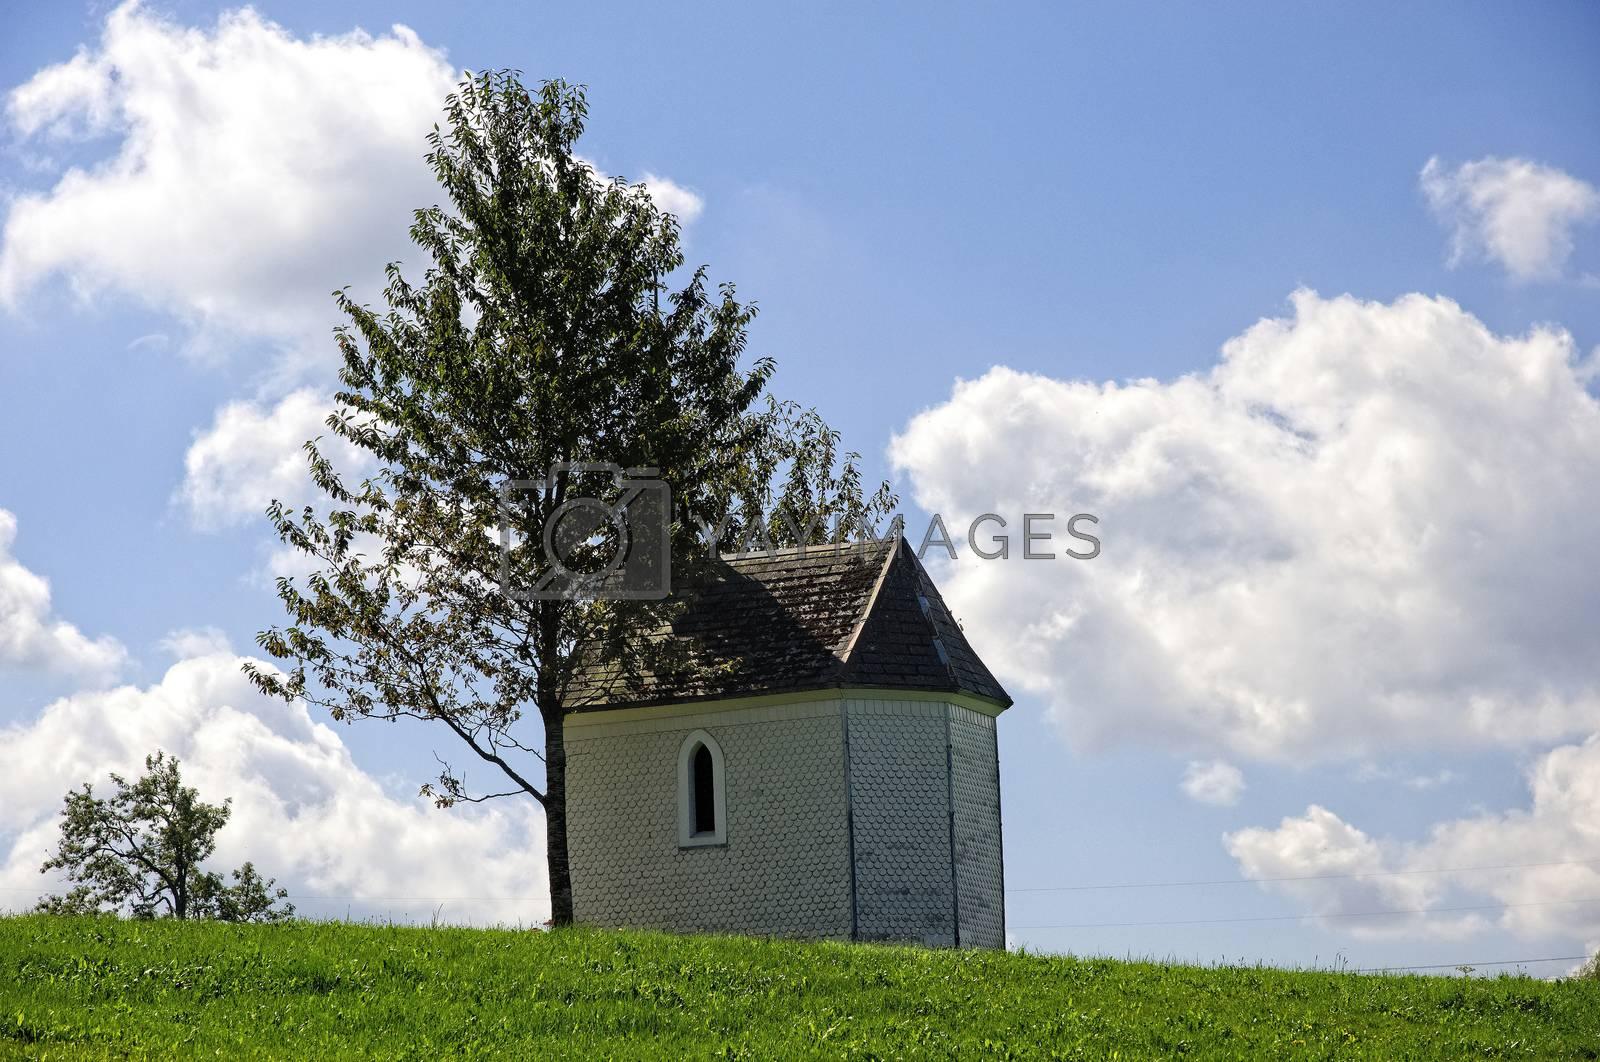 Chapel in Germany on green field with blue sky